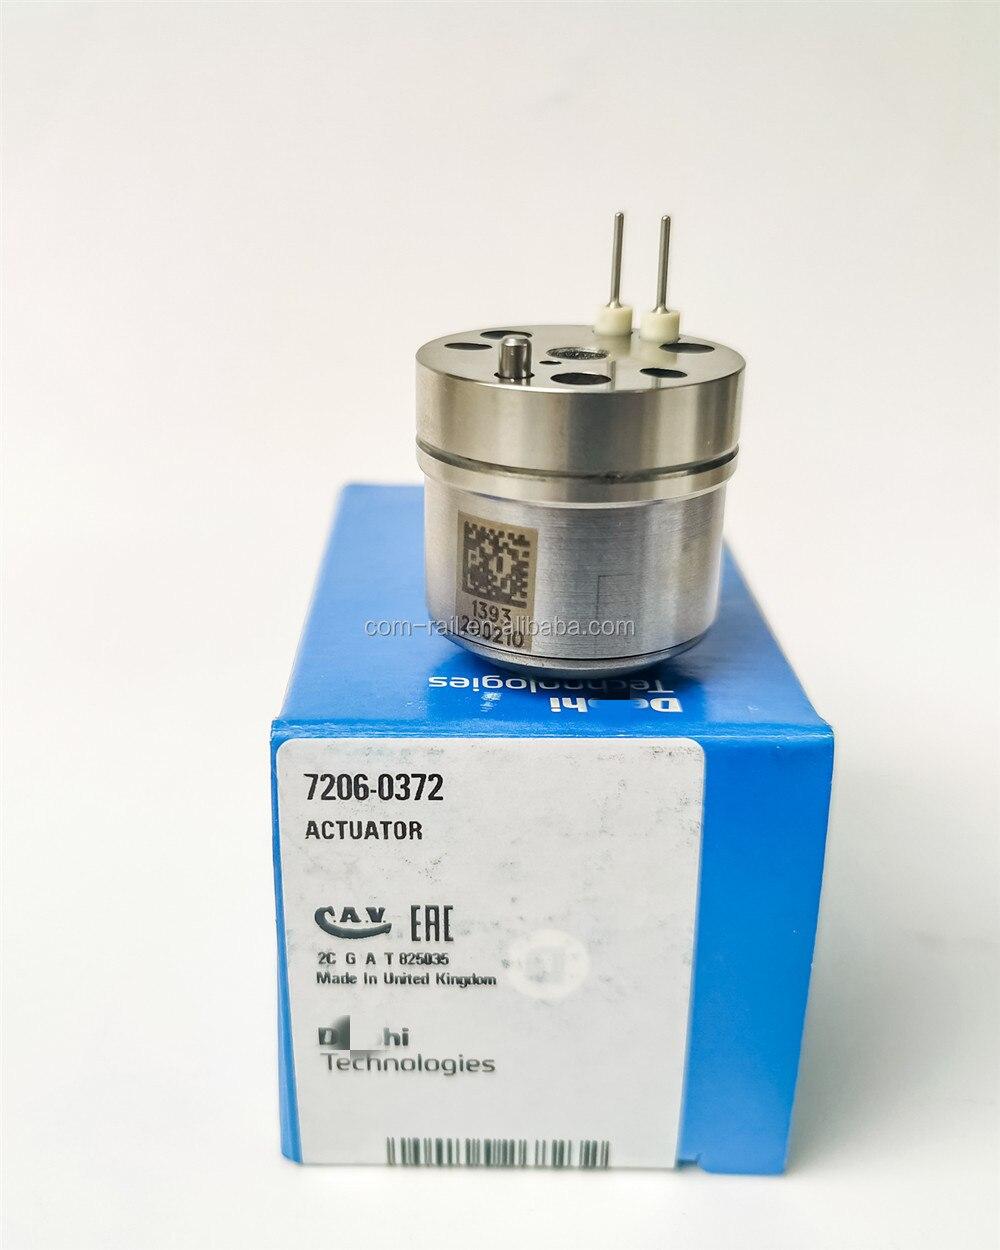 genuine solenoid valve actuator kit 7206-0372 enlarge